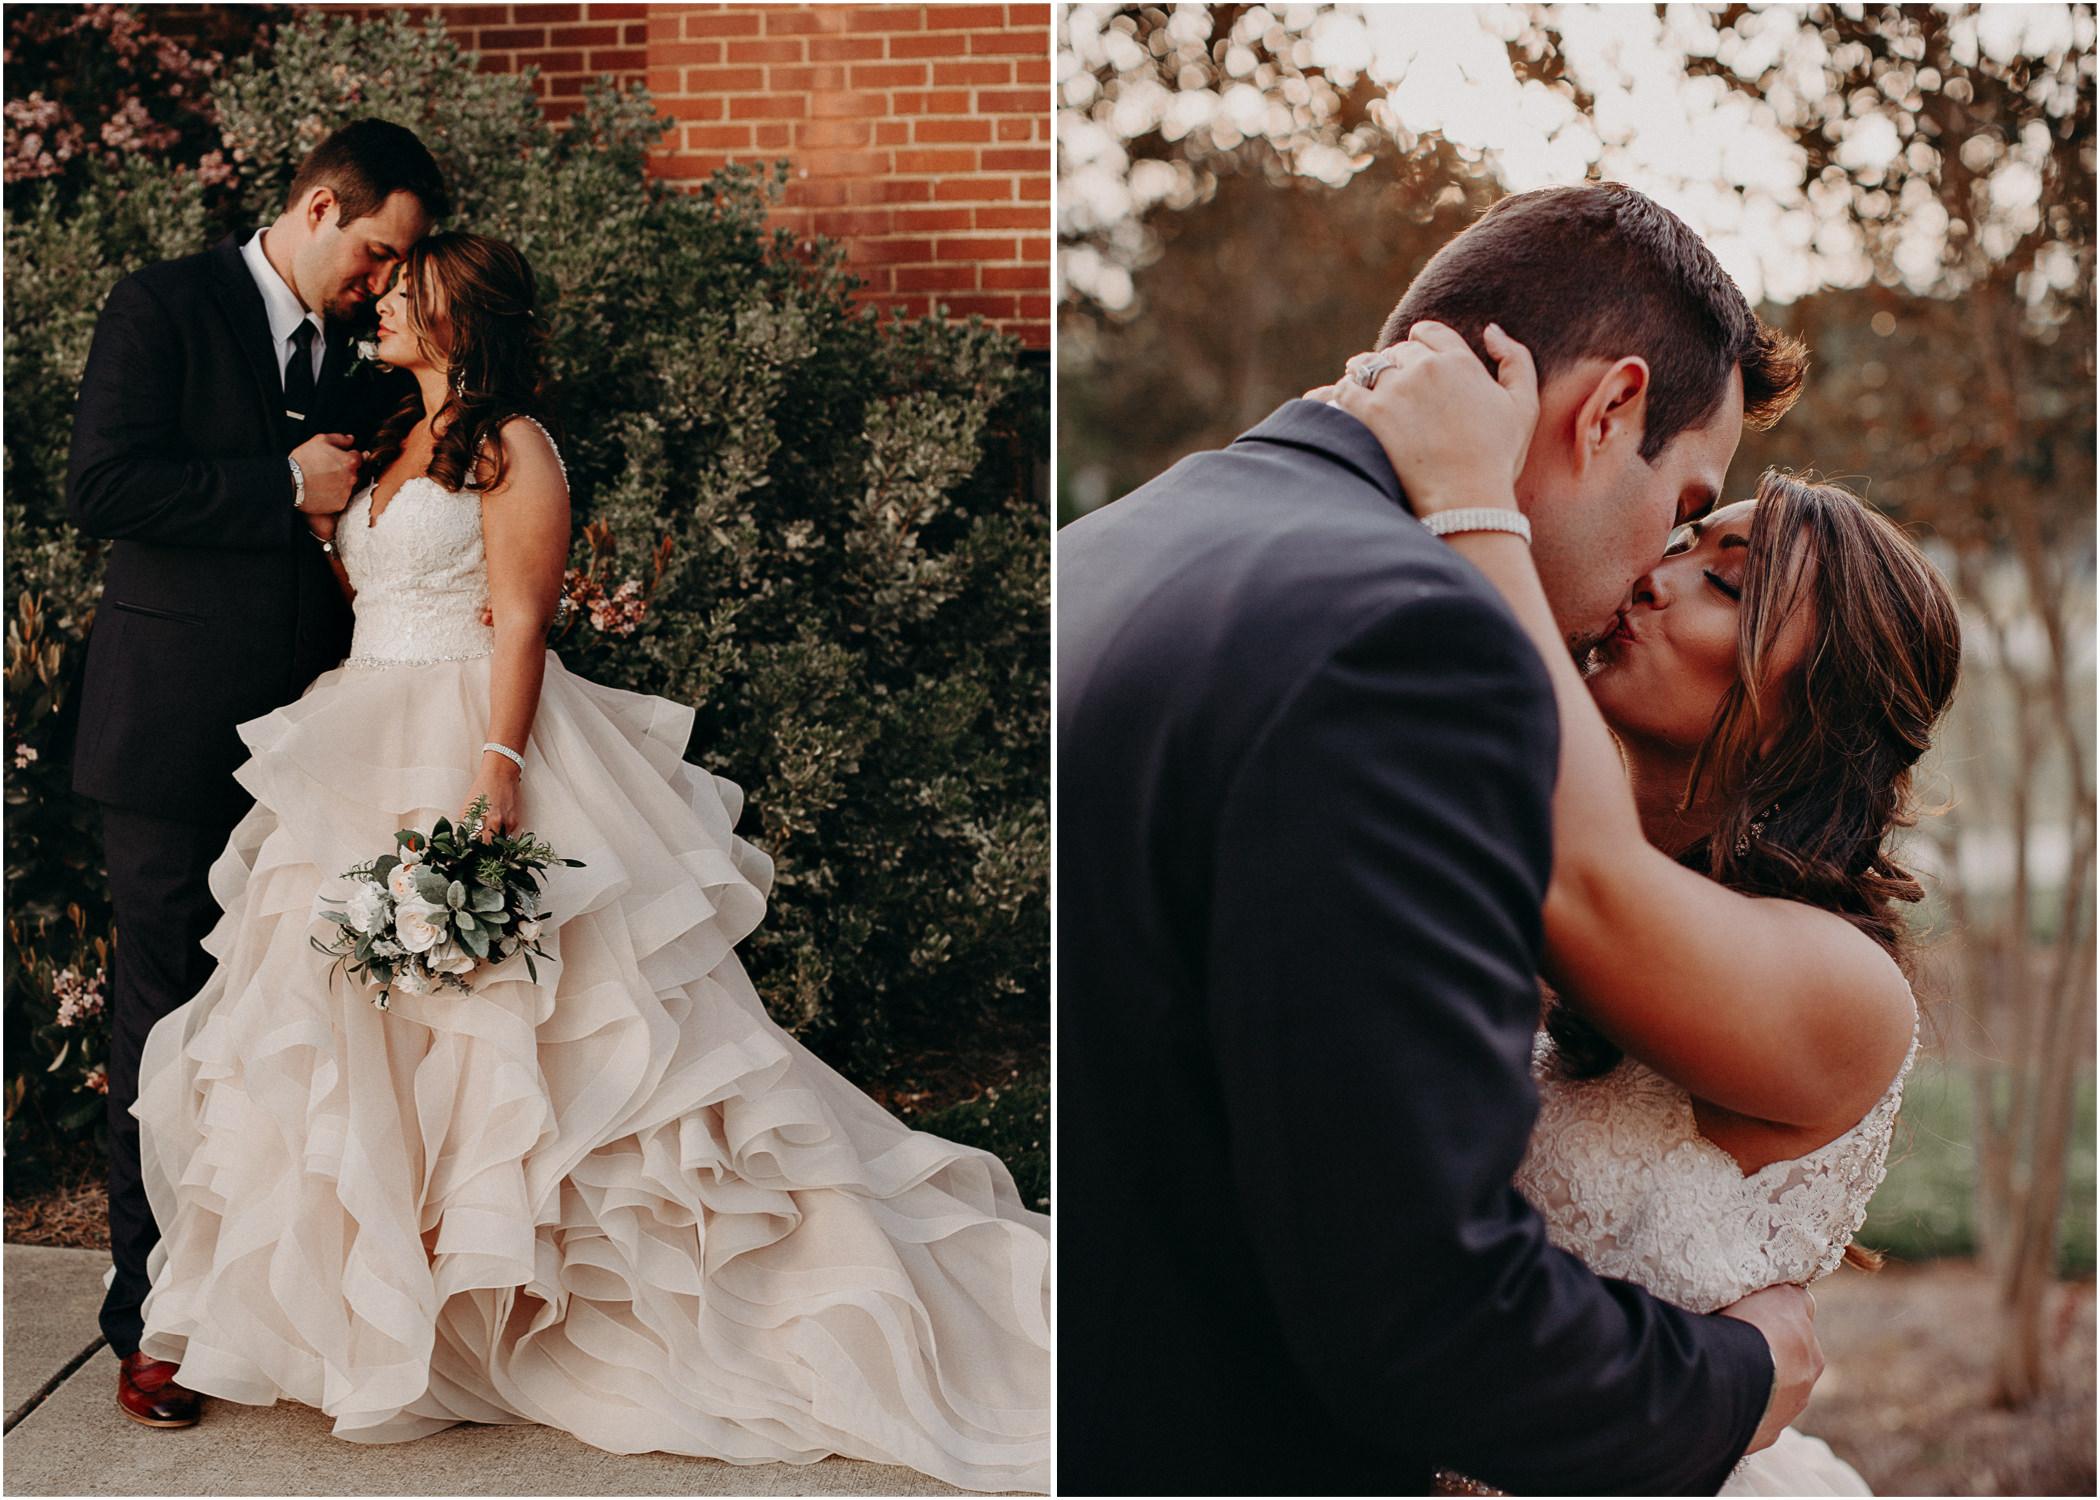 56 4 - Atlanta Wedding Photographer - The engine room - Ga - Wedding trends - Aline Marin Photography.jpg